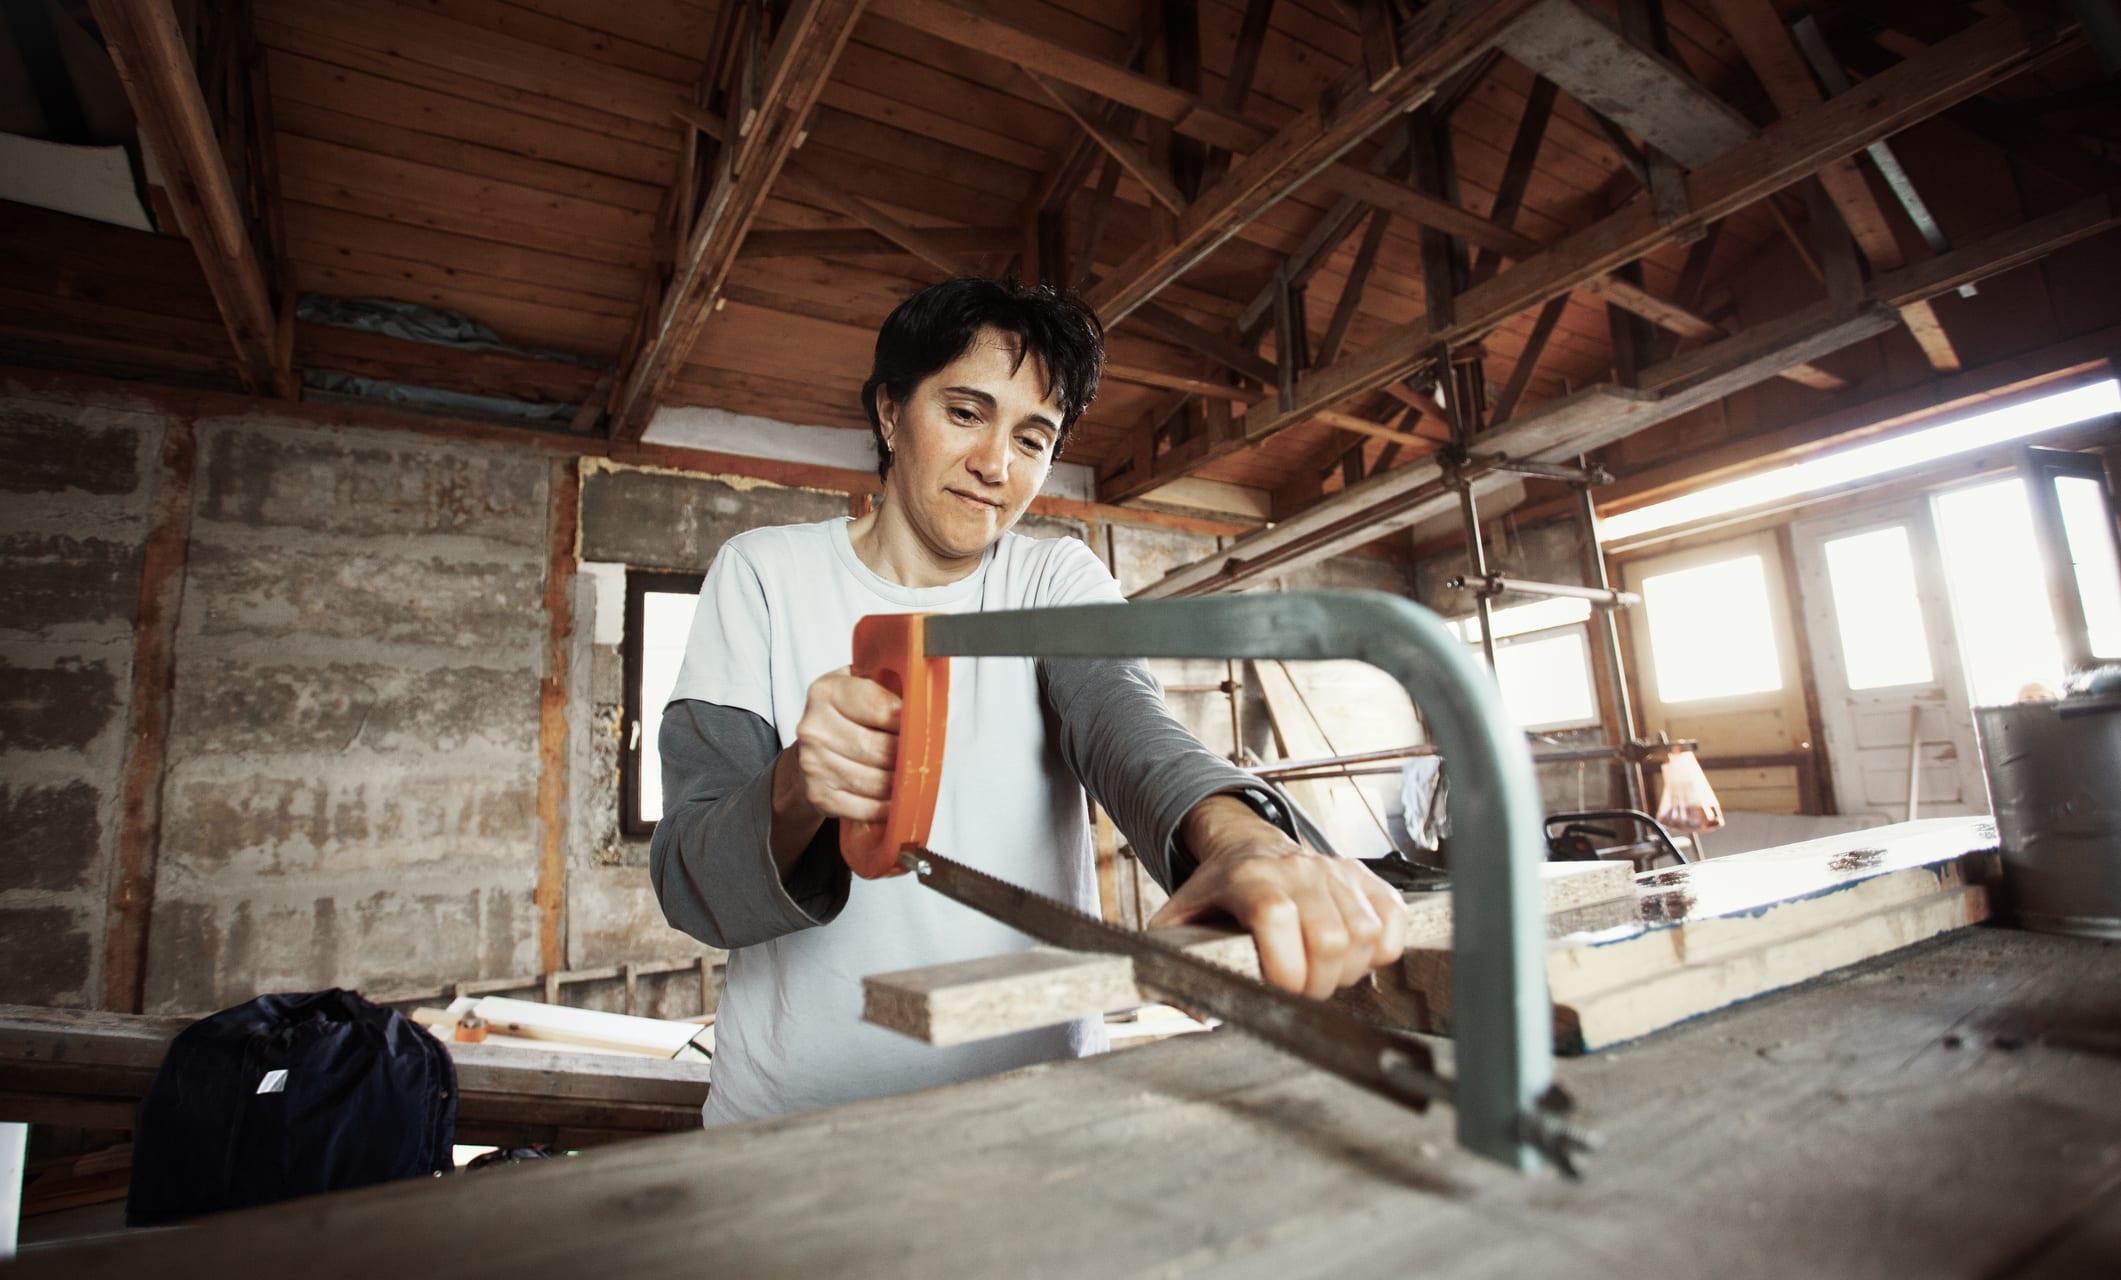 Woman Using Hand saw